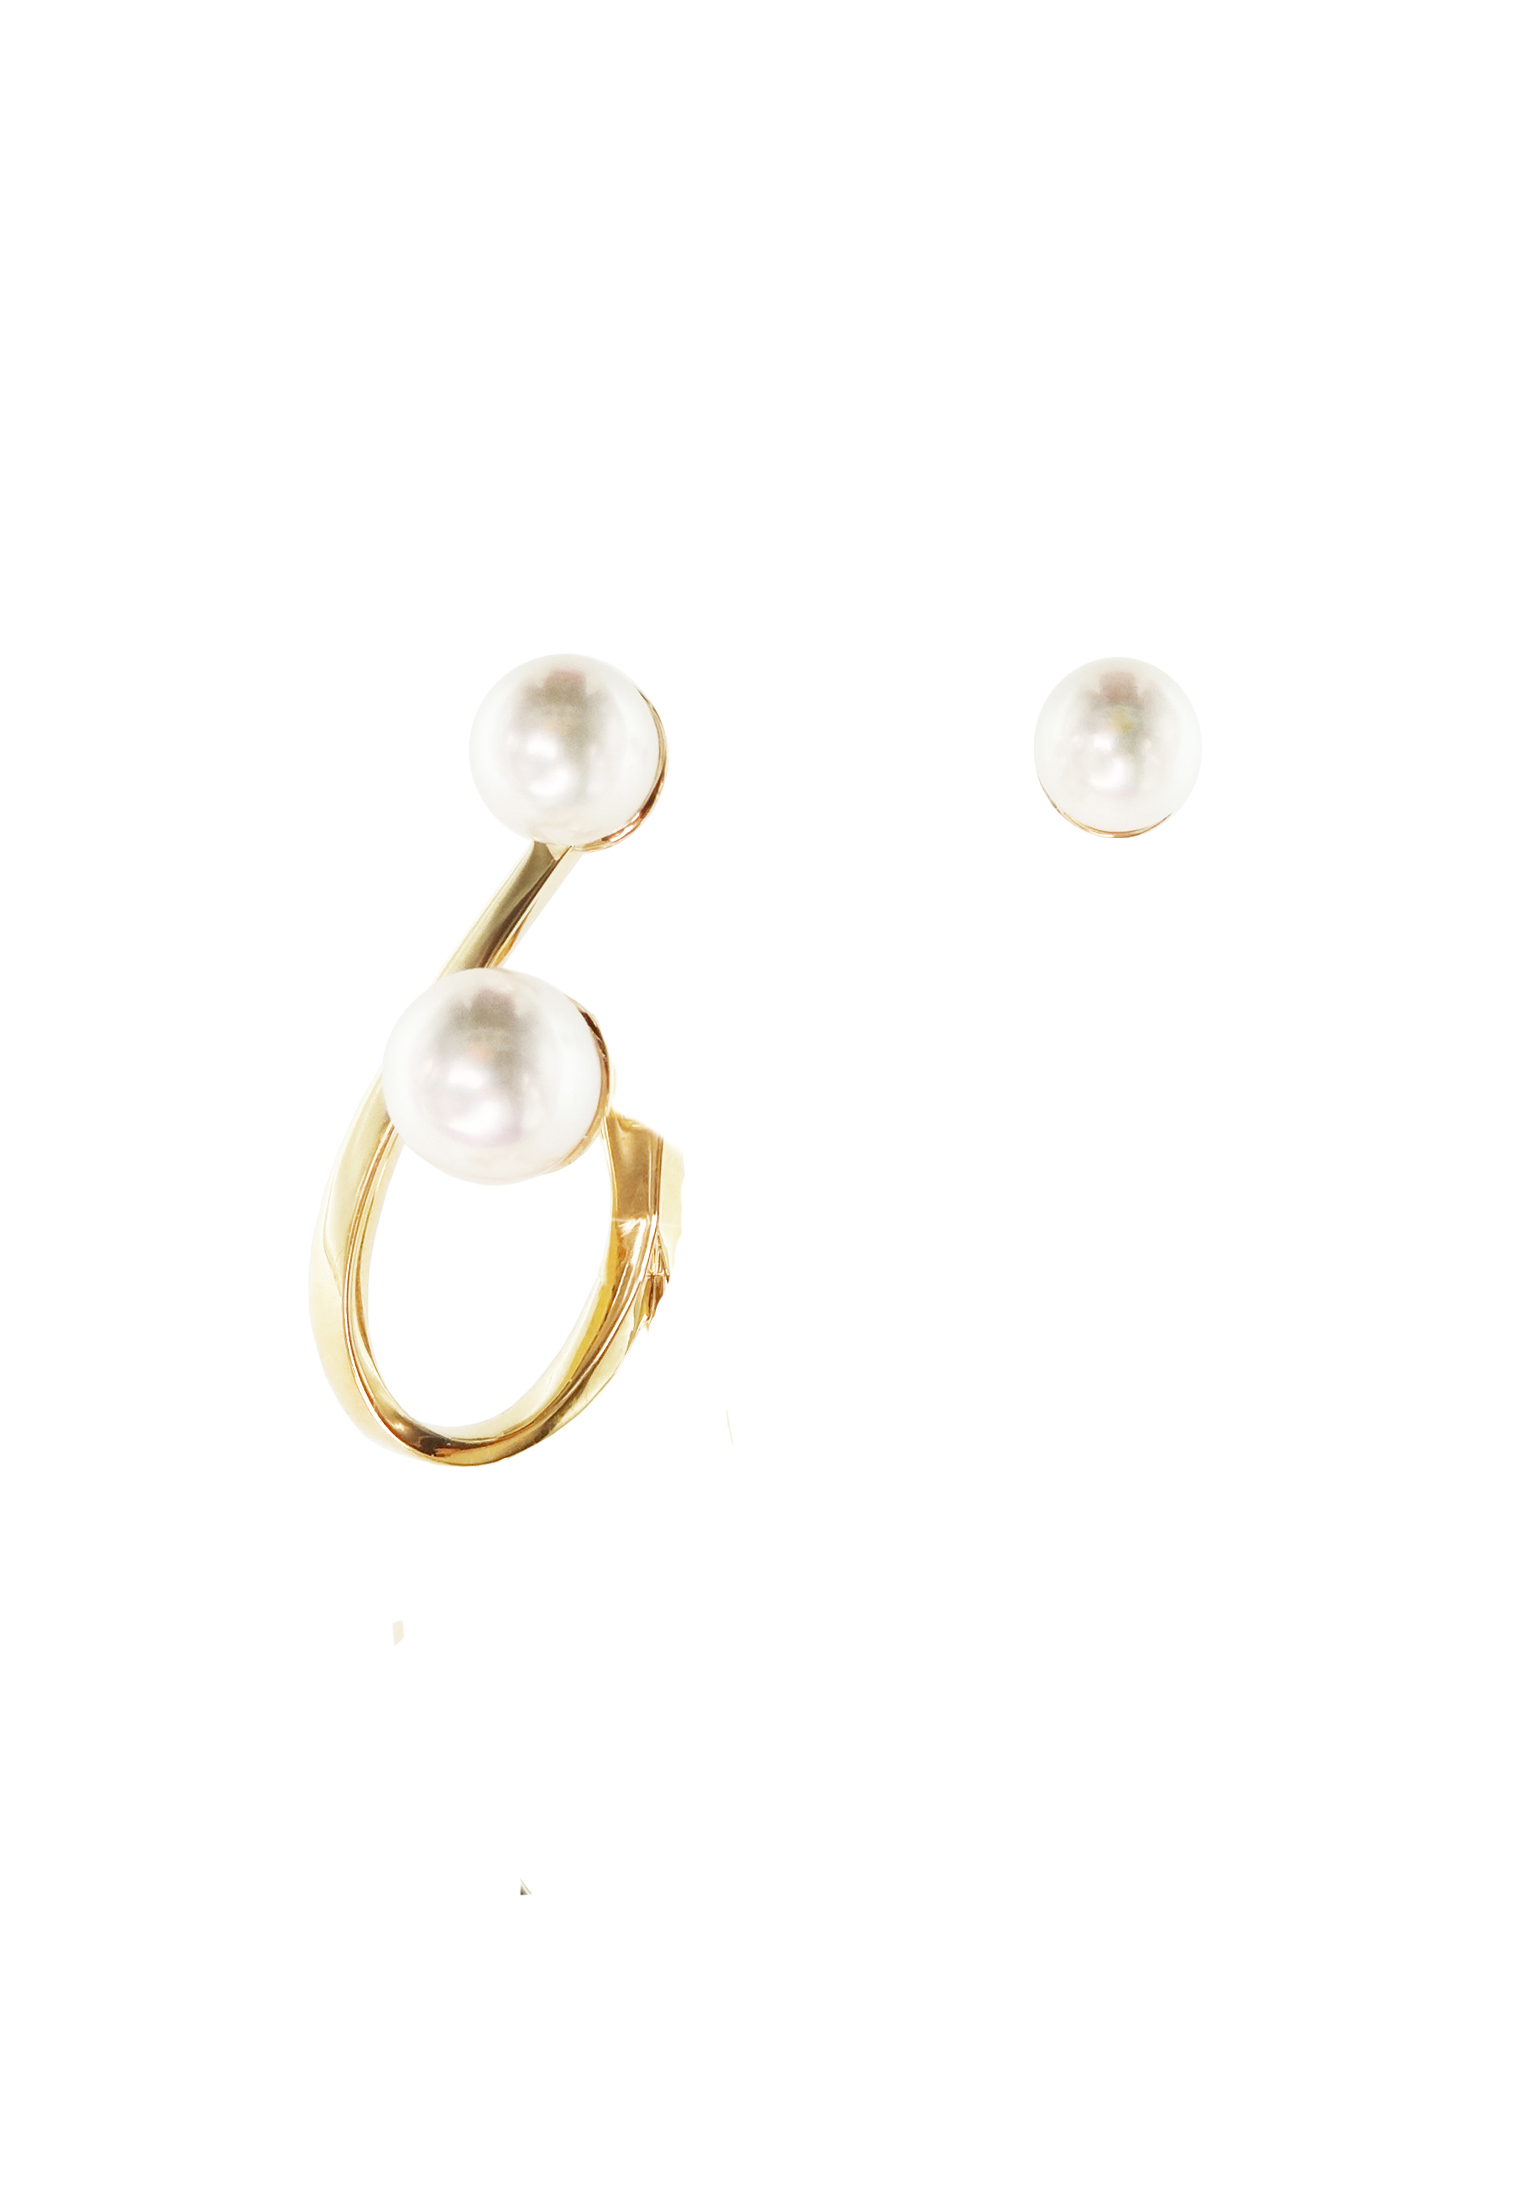 Monorecchino in oro giallo 18k con perle Akoya